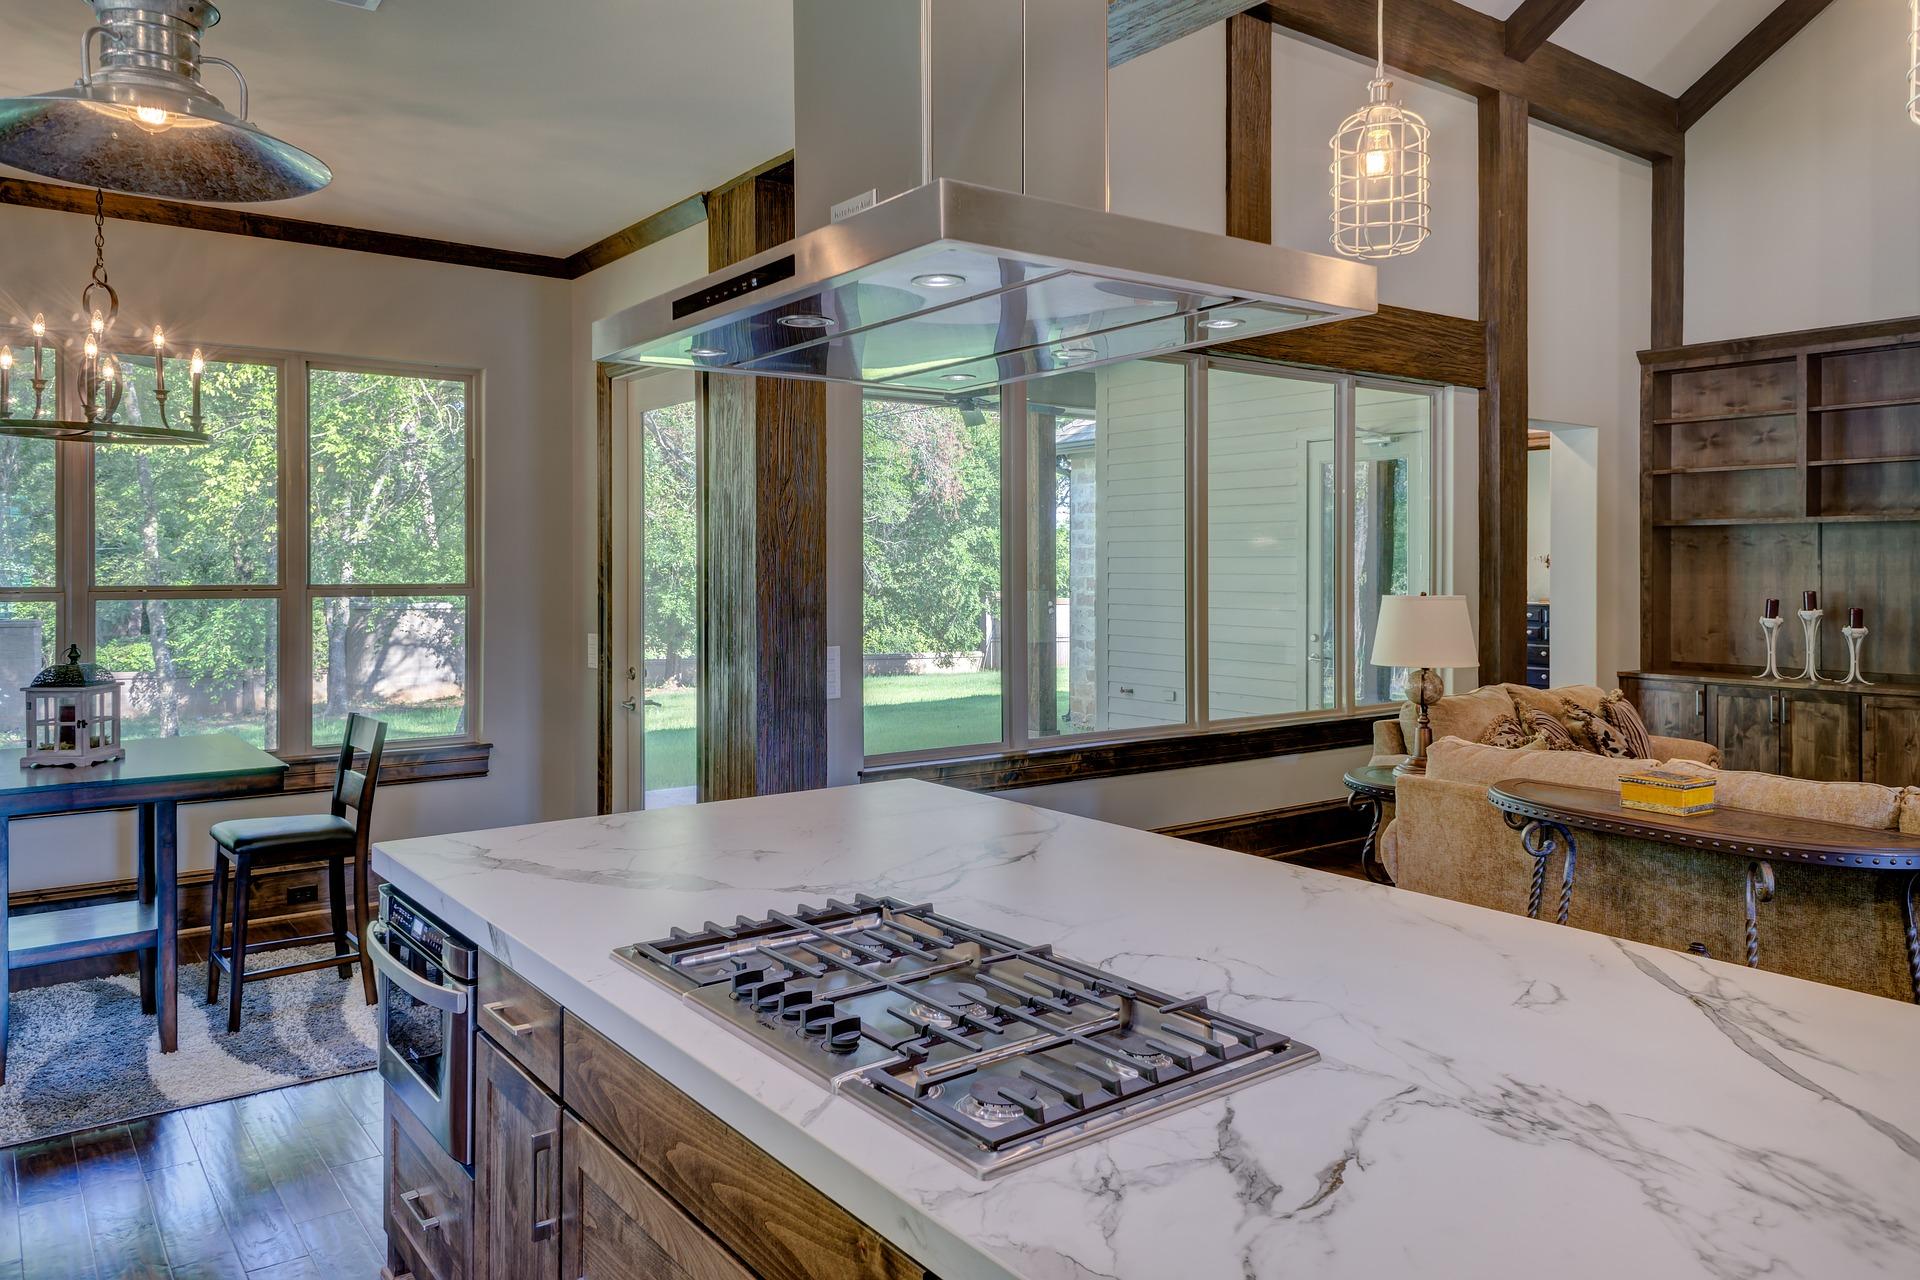 stainless steel island range hood installed over an island drop-in cooktop.